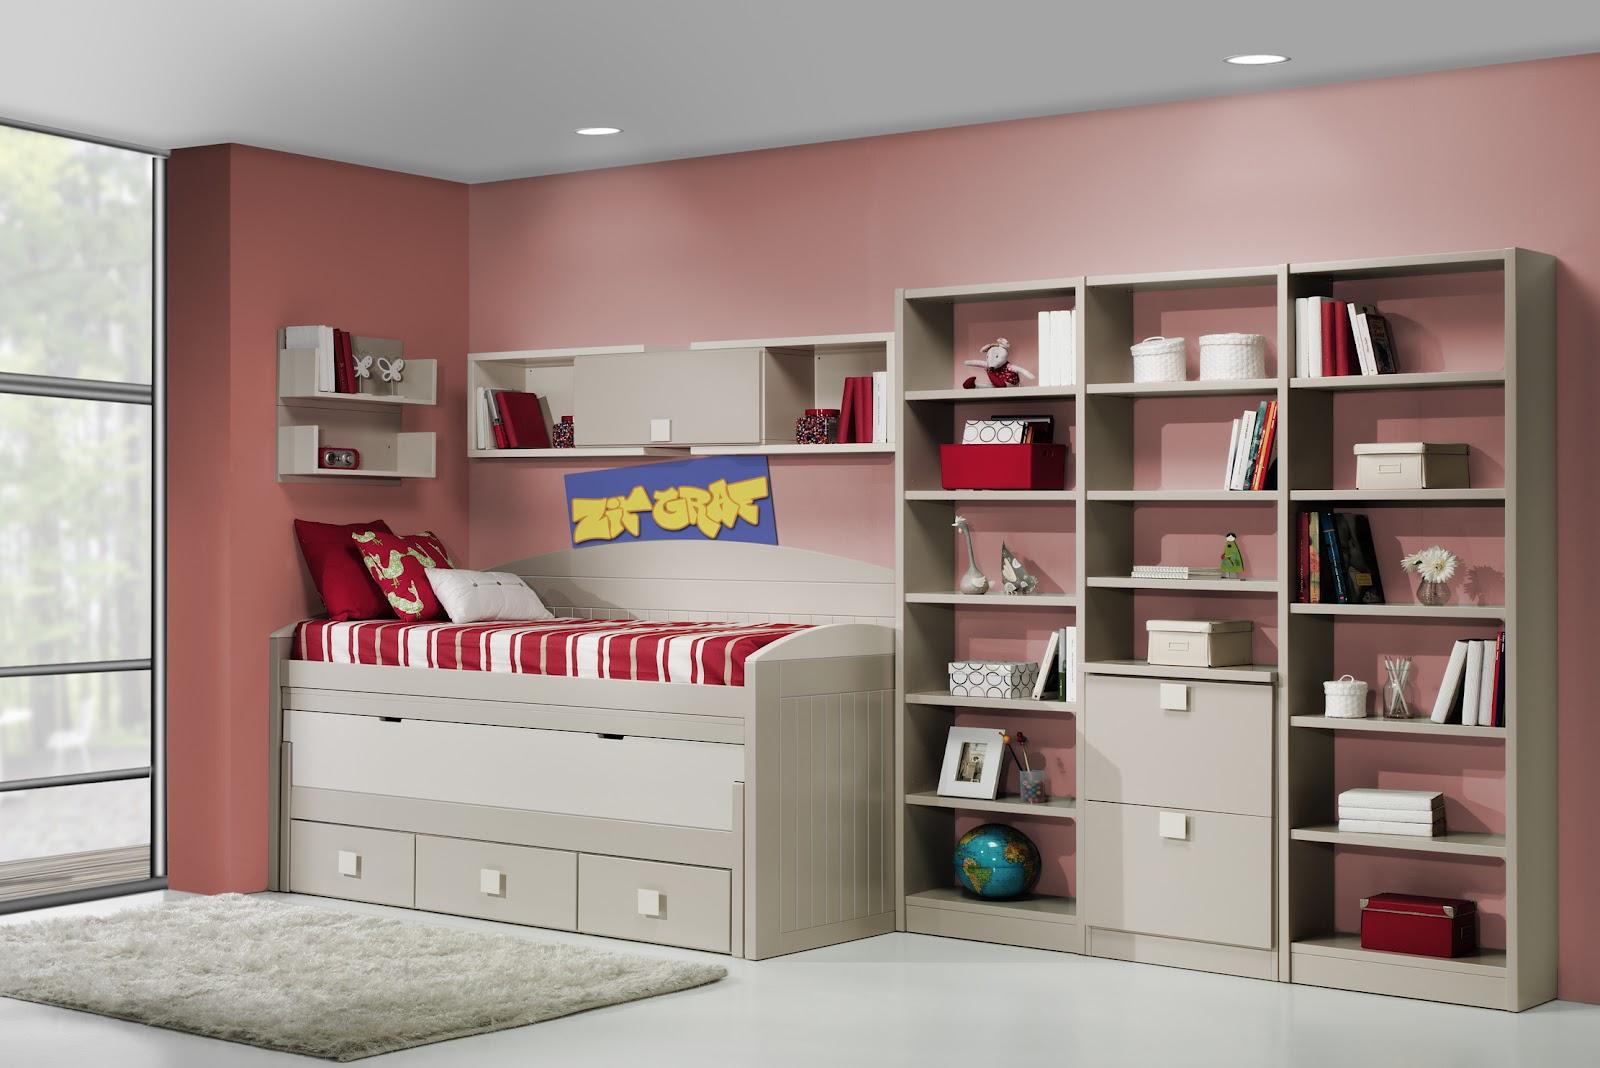 Dormitorios habitaciones juveniles e infantiles lacadas for Colores para recamaras juveniles